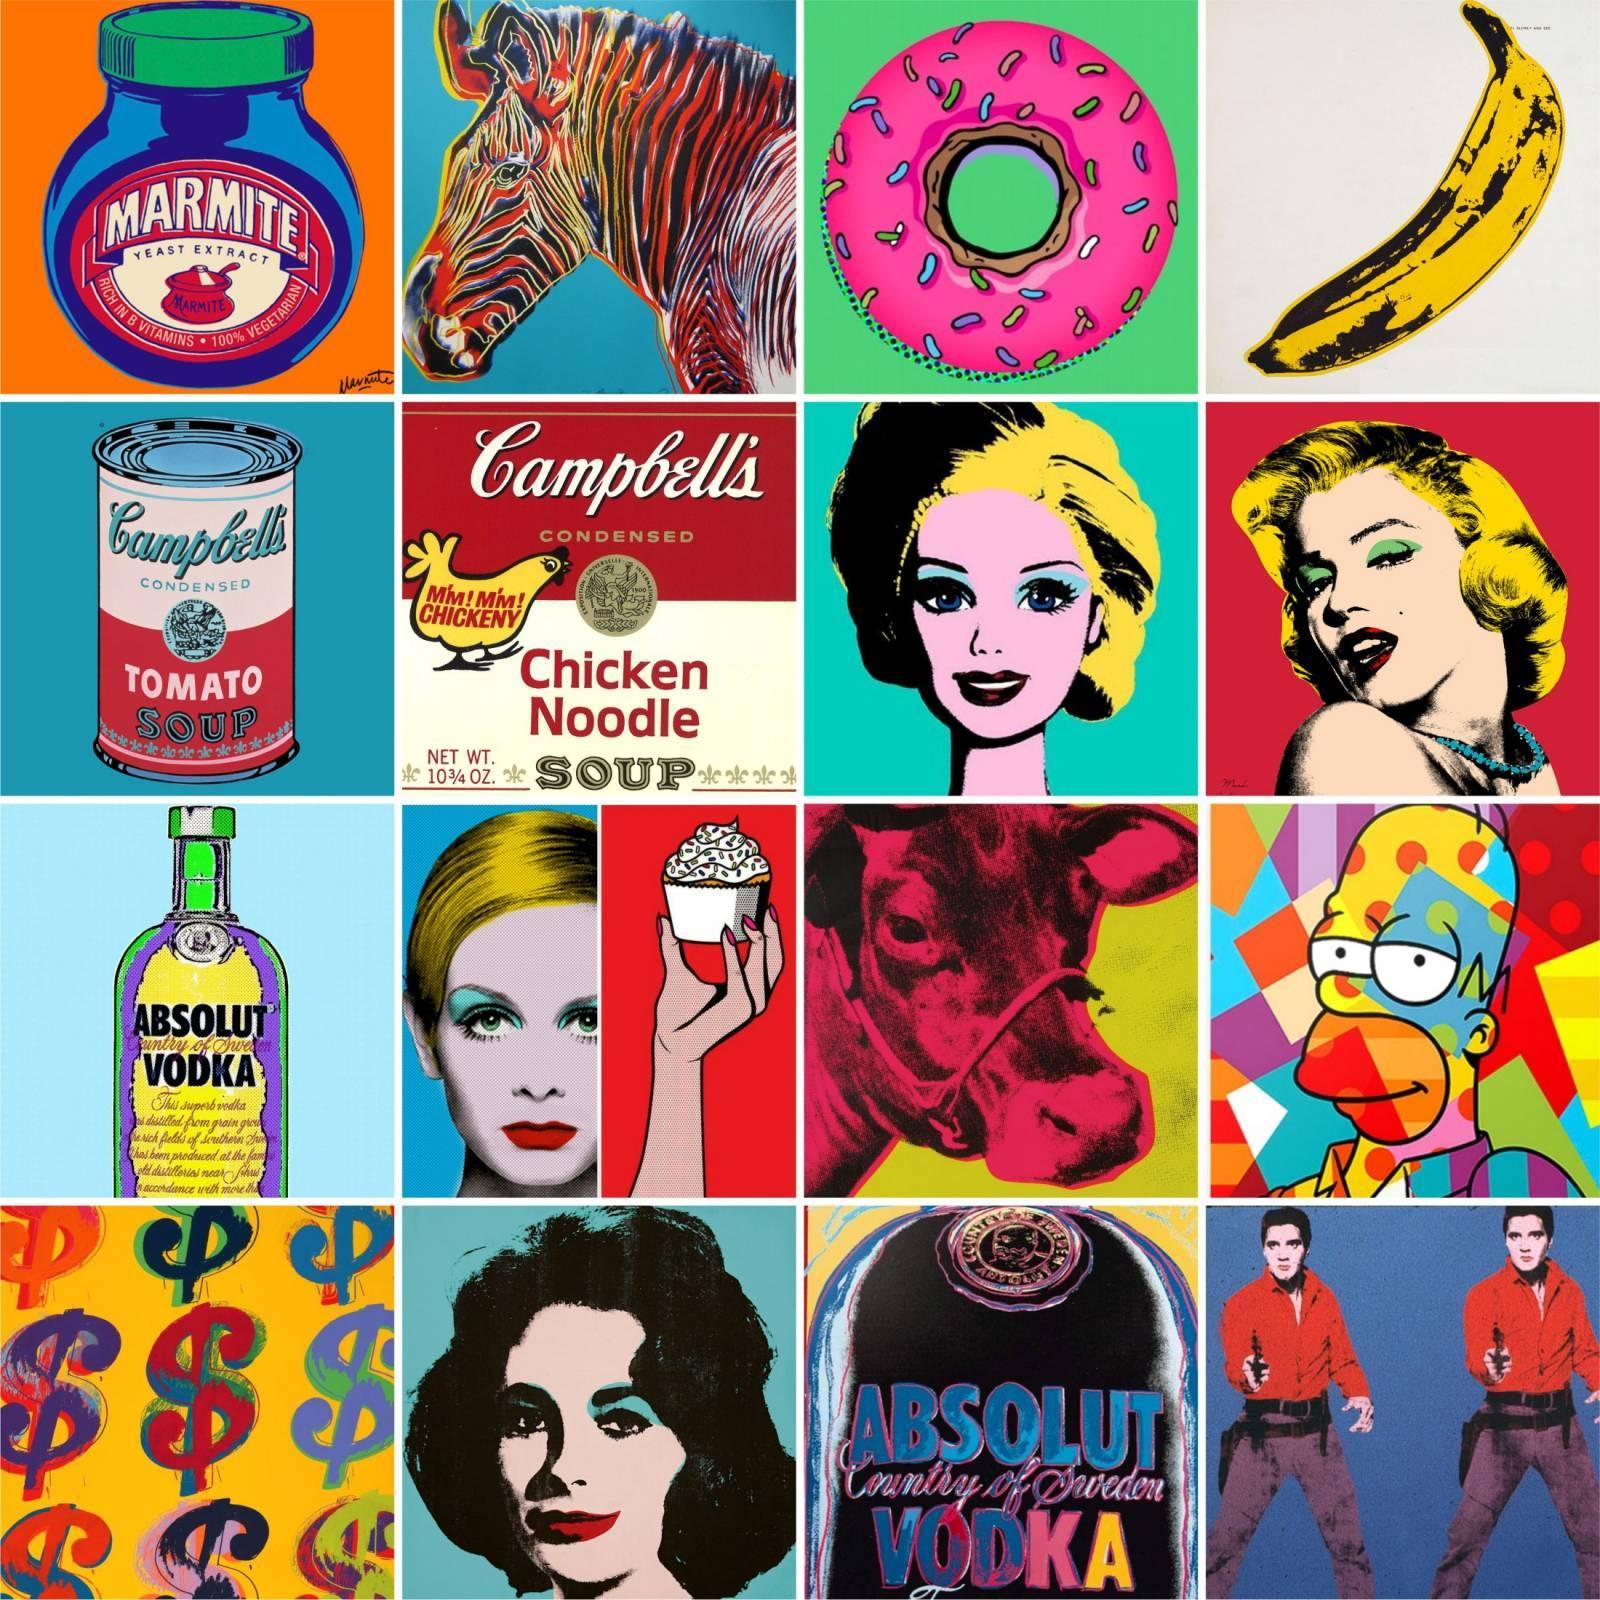 Como Funciona O Adesivo De Credito Santander ~ Adesivo para Azulejo Pop Art Redecorei